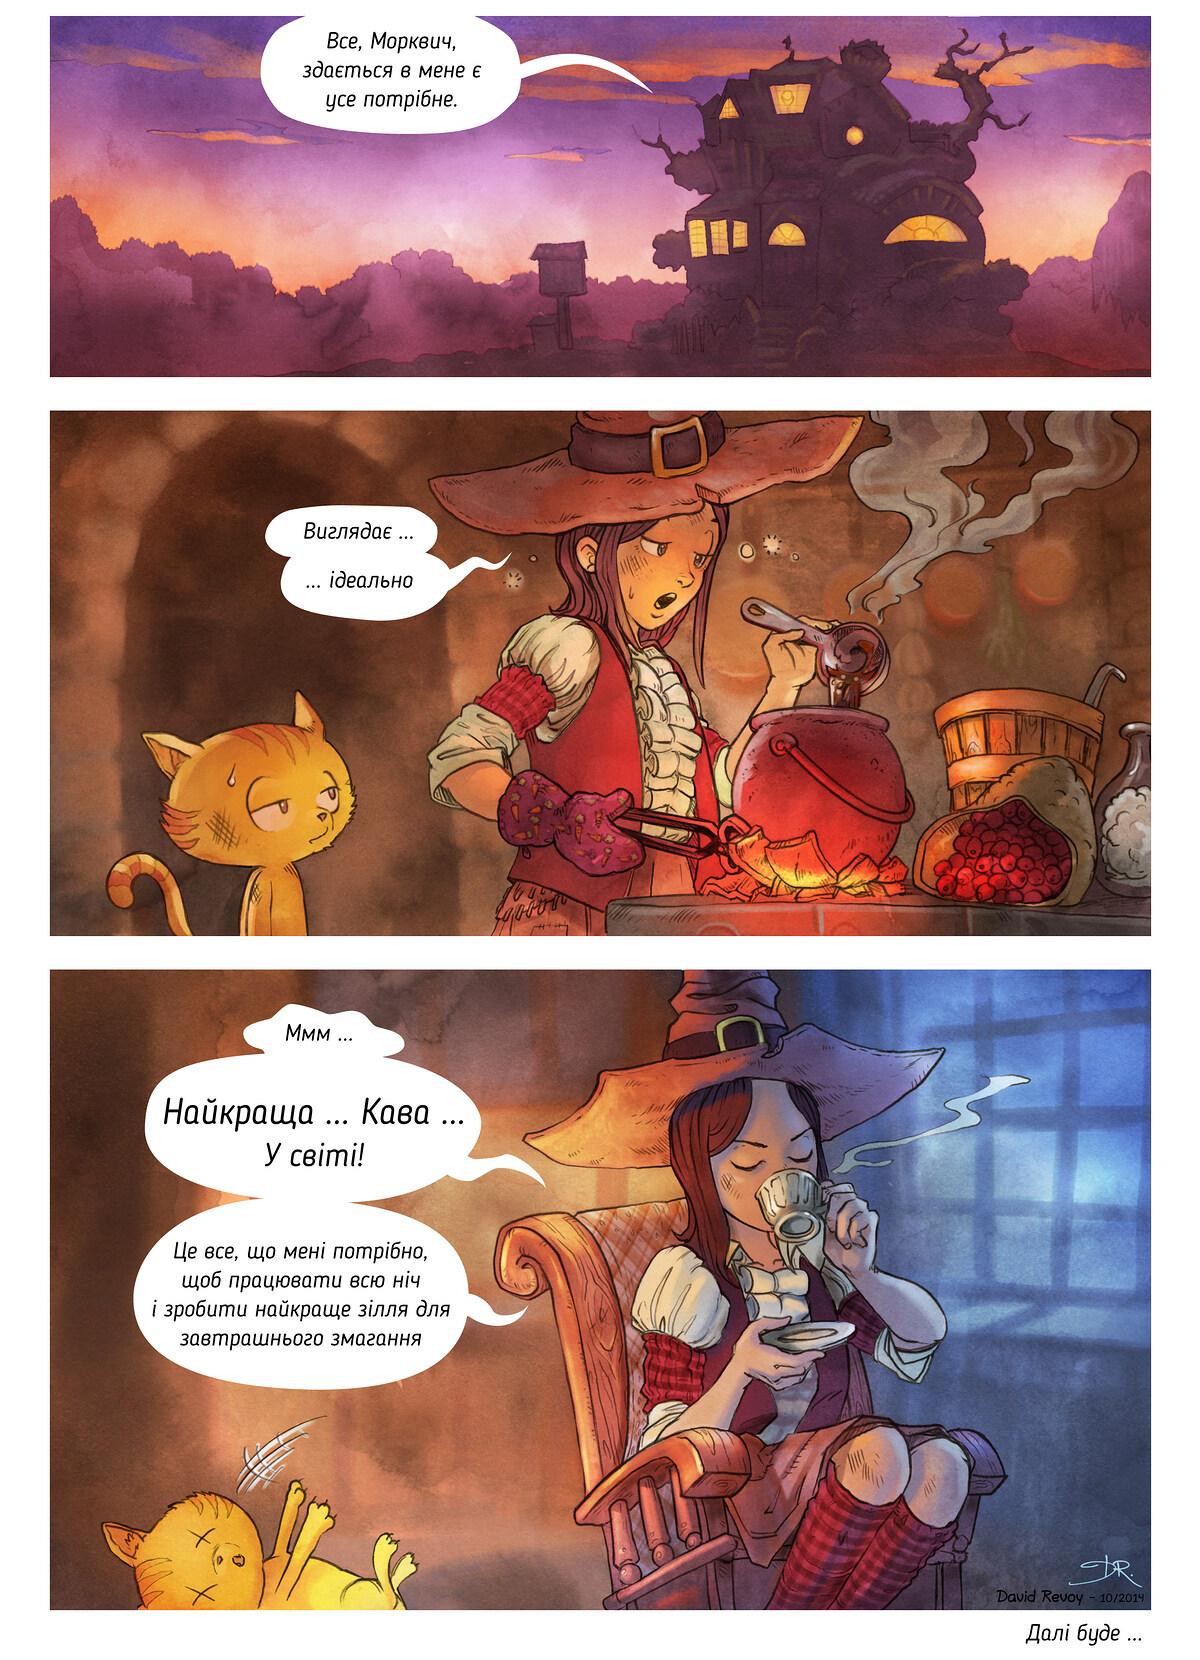 A webcomic page of Pepper&Carrot, епізод 3 [uk], стор. 7